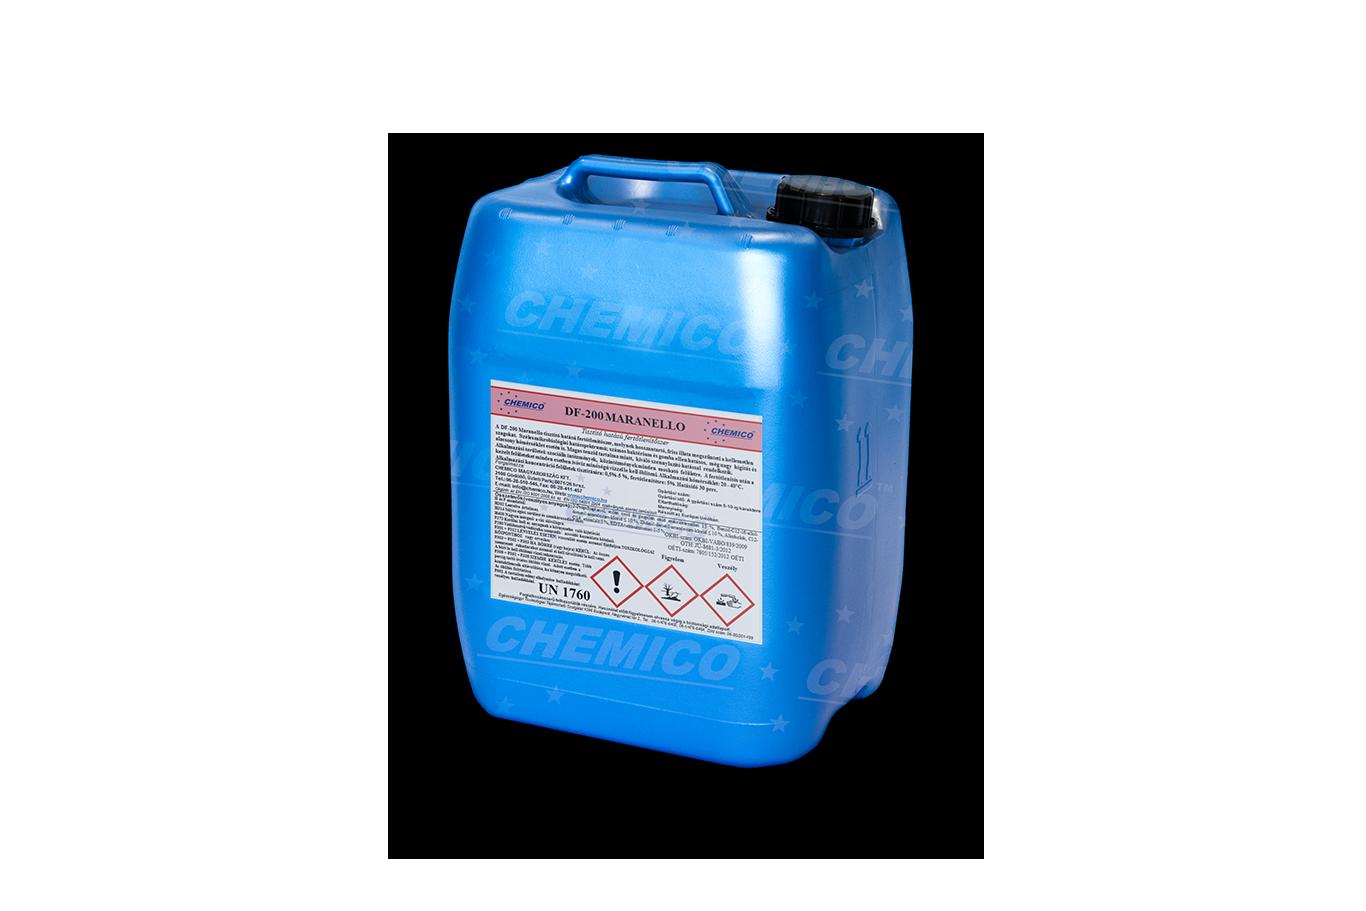 df-200-maranello-fertotlenito-tisztito-semleges-ipari-illatos-chemico-20l